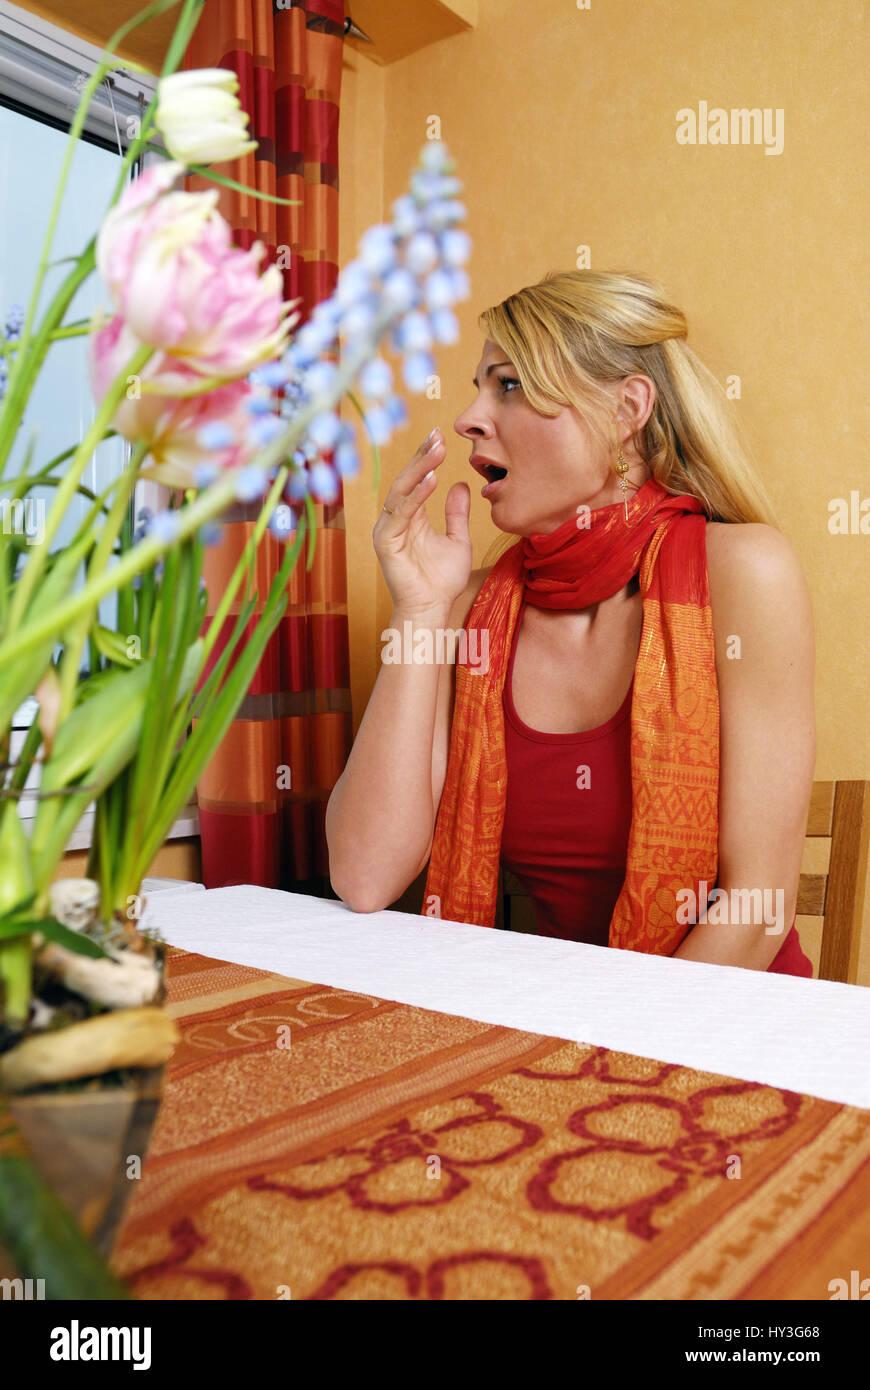 Woman yawns, spring tiredness, Frau gähnt, Frühjahrsmüdigkeit - Stock Image